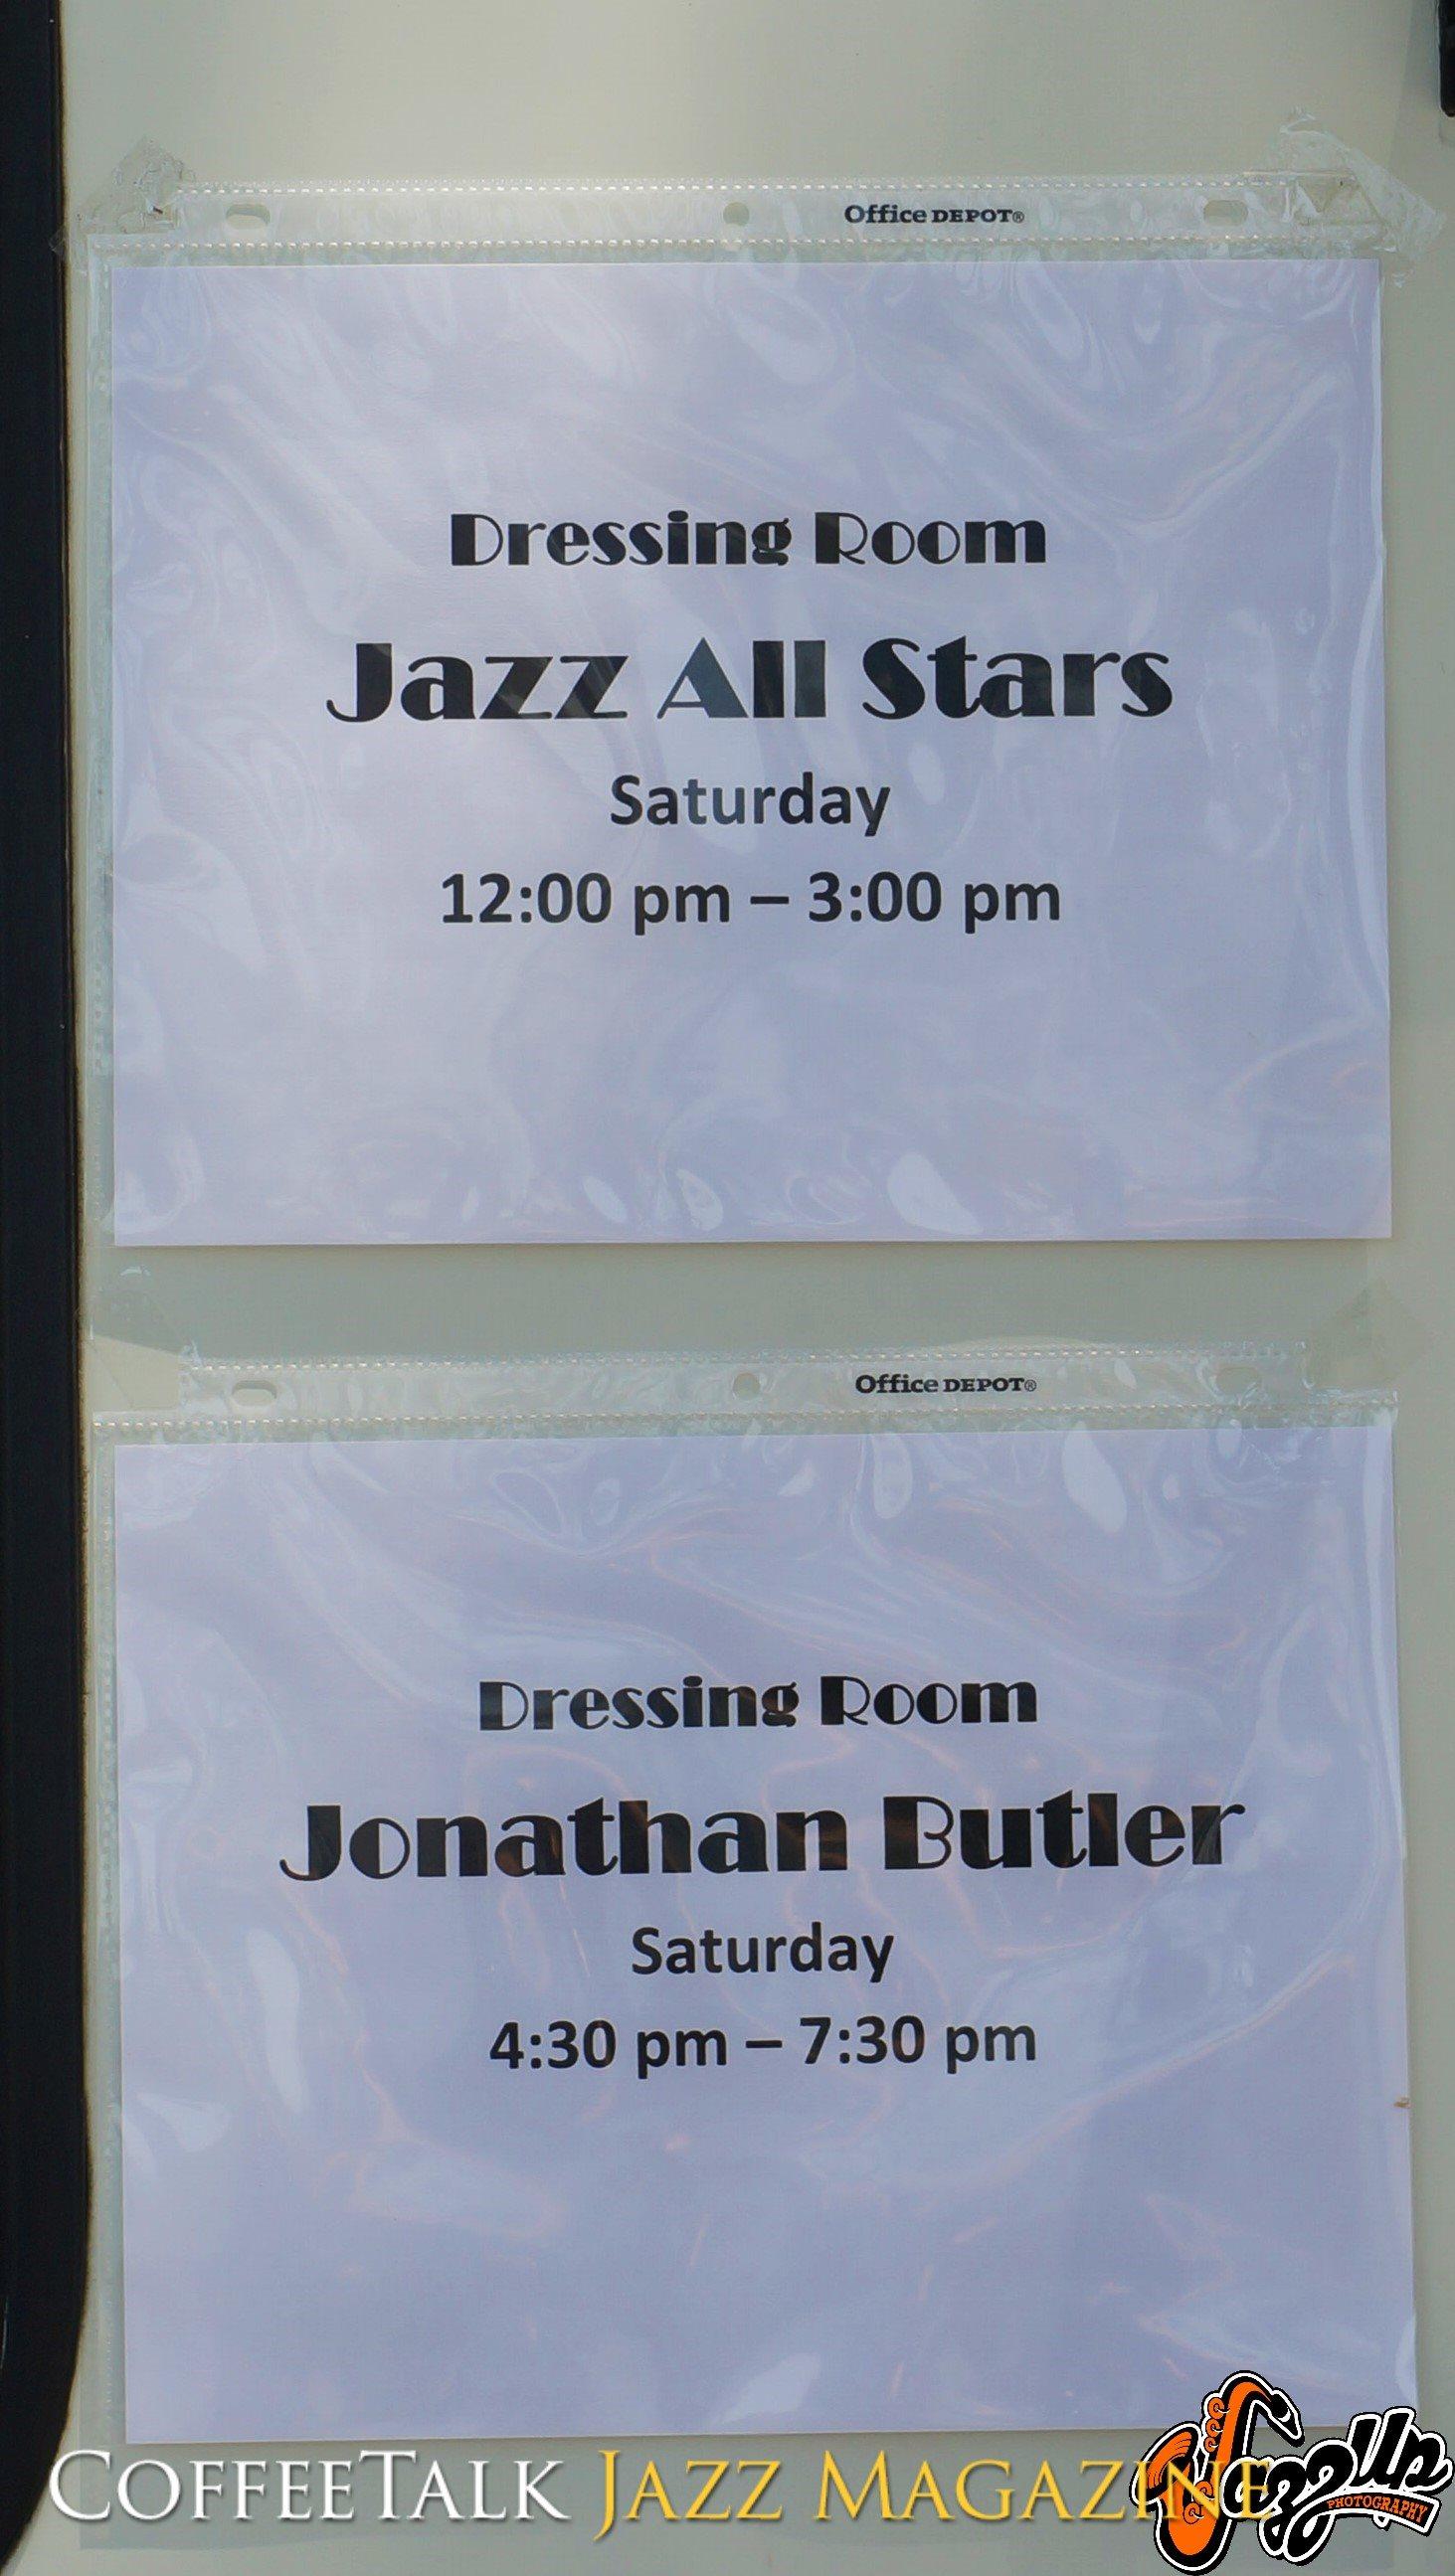 Long beach jazz fest Saturday 026.JPG